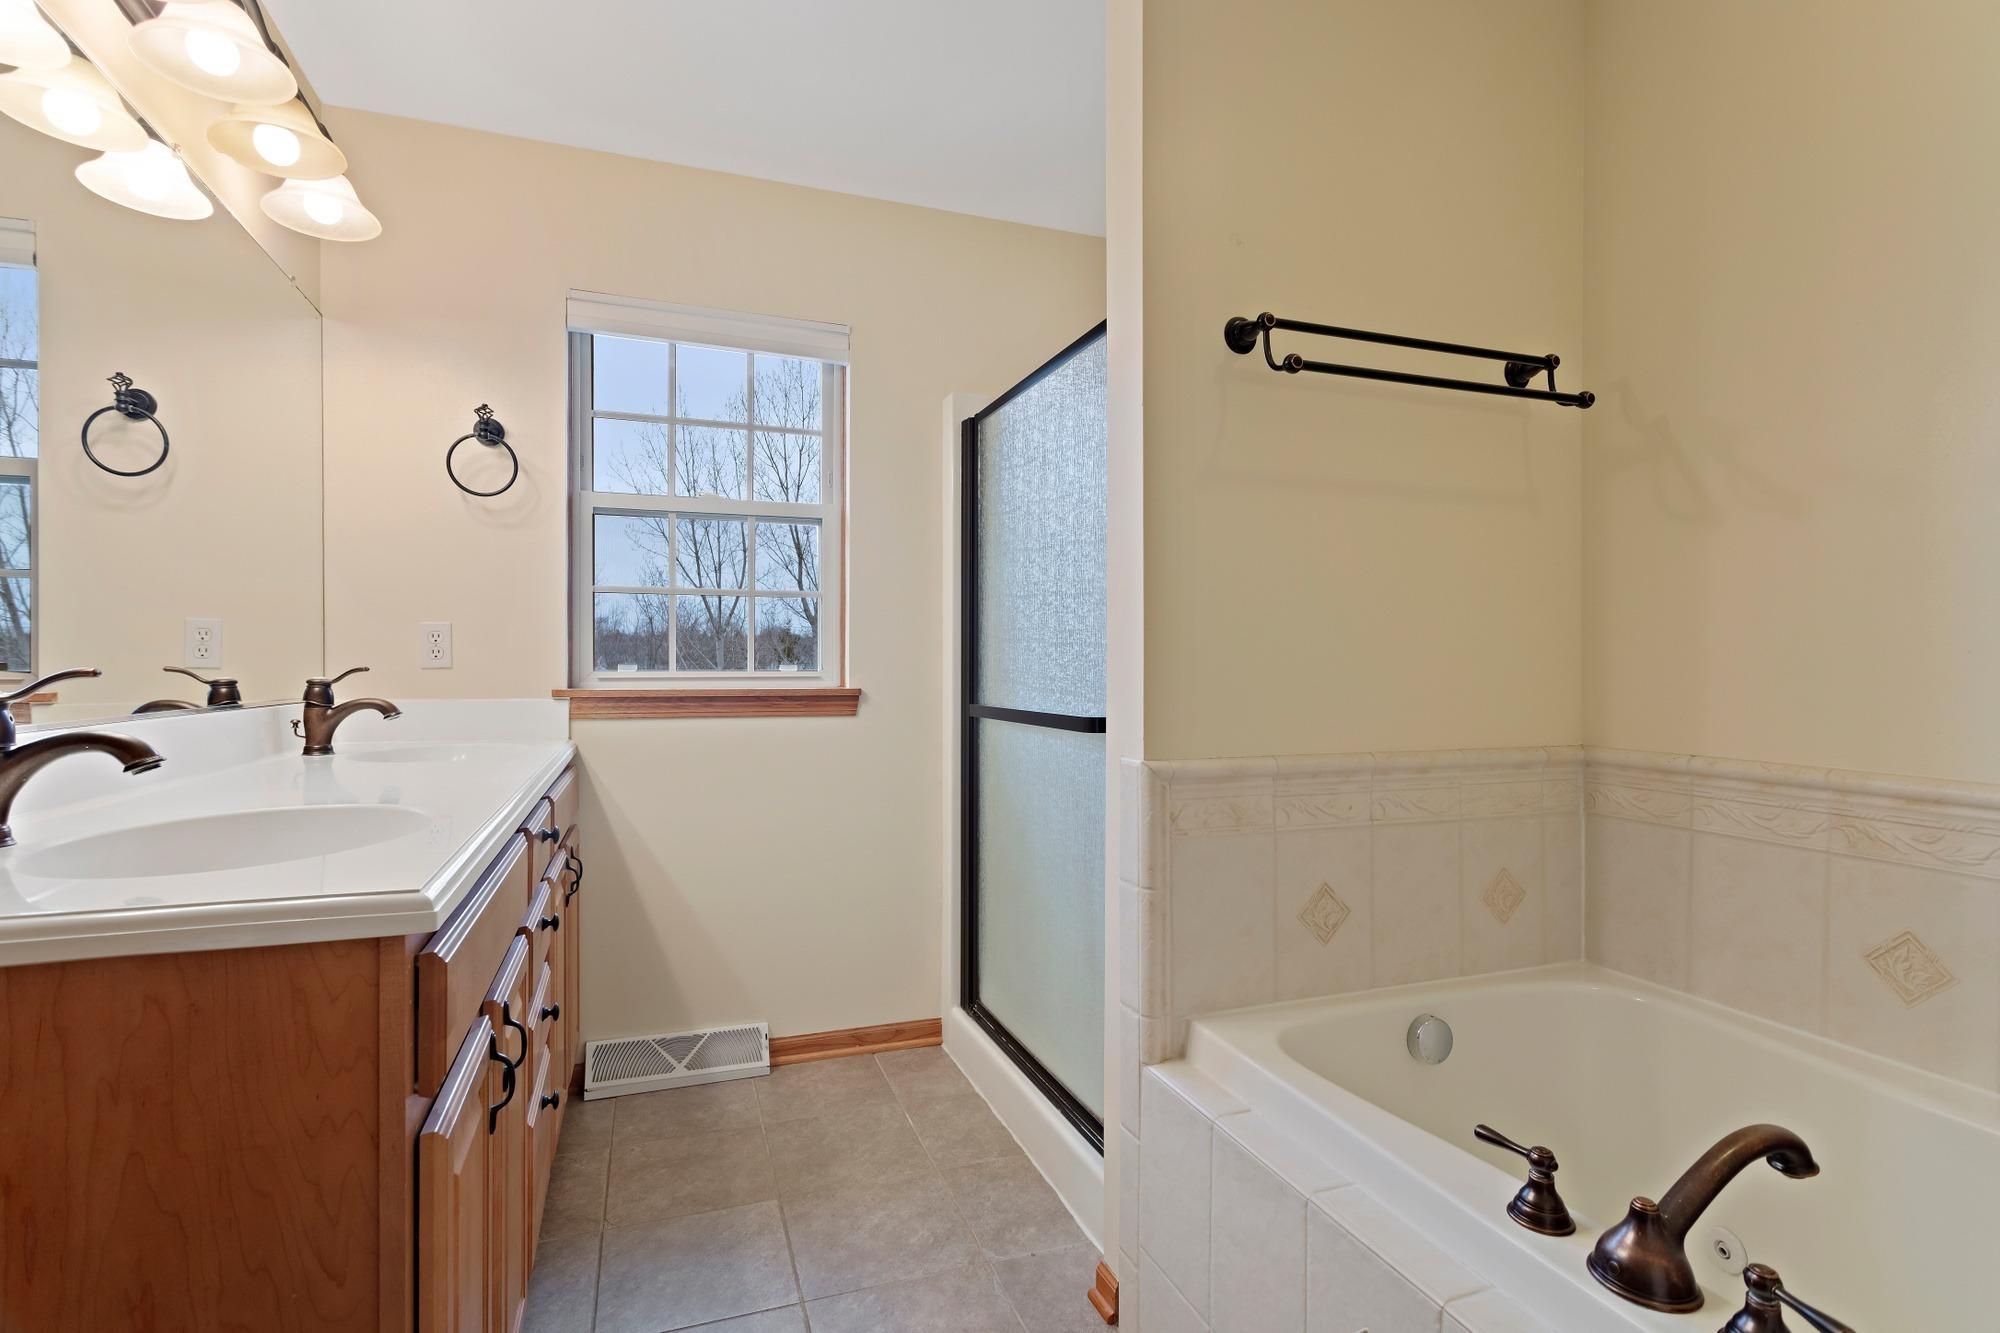 27_En Suite Bathroom with Shower and Jet